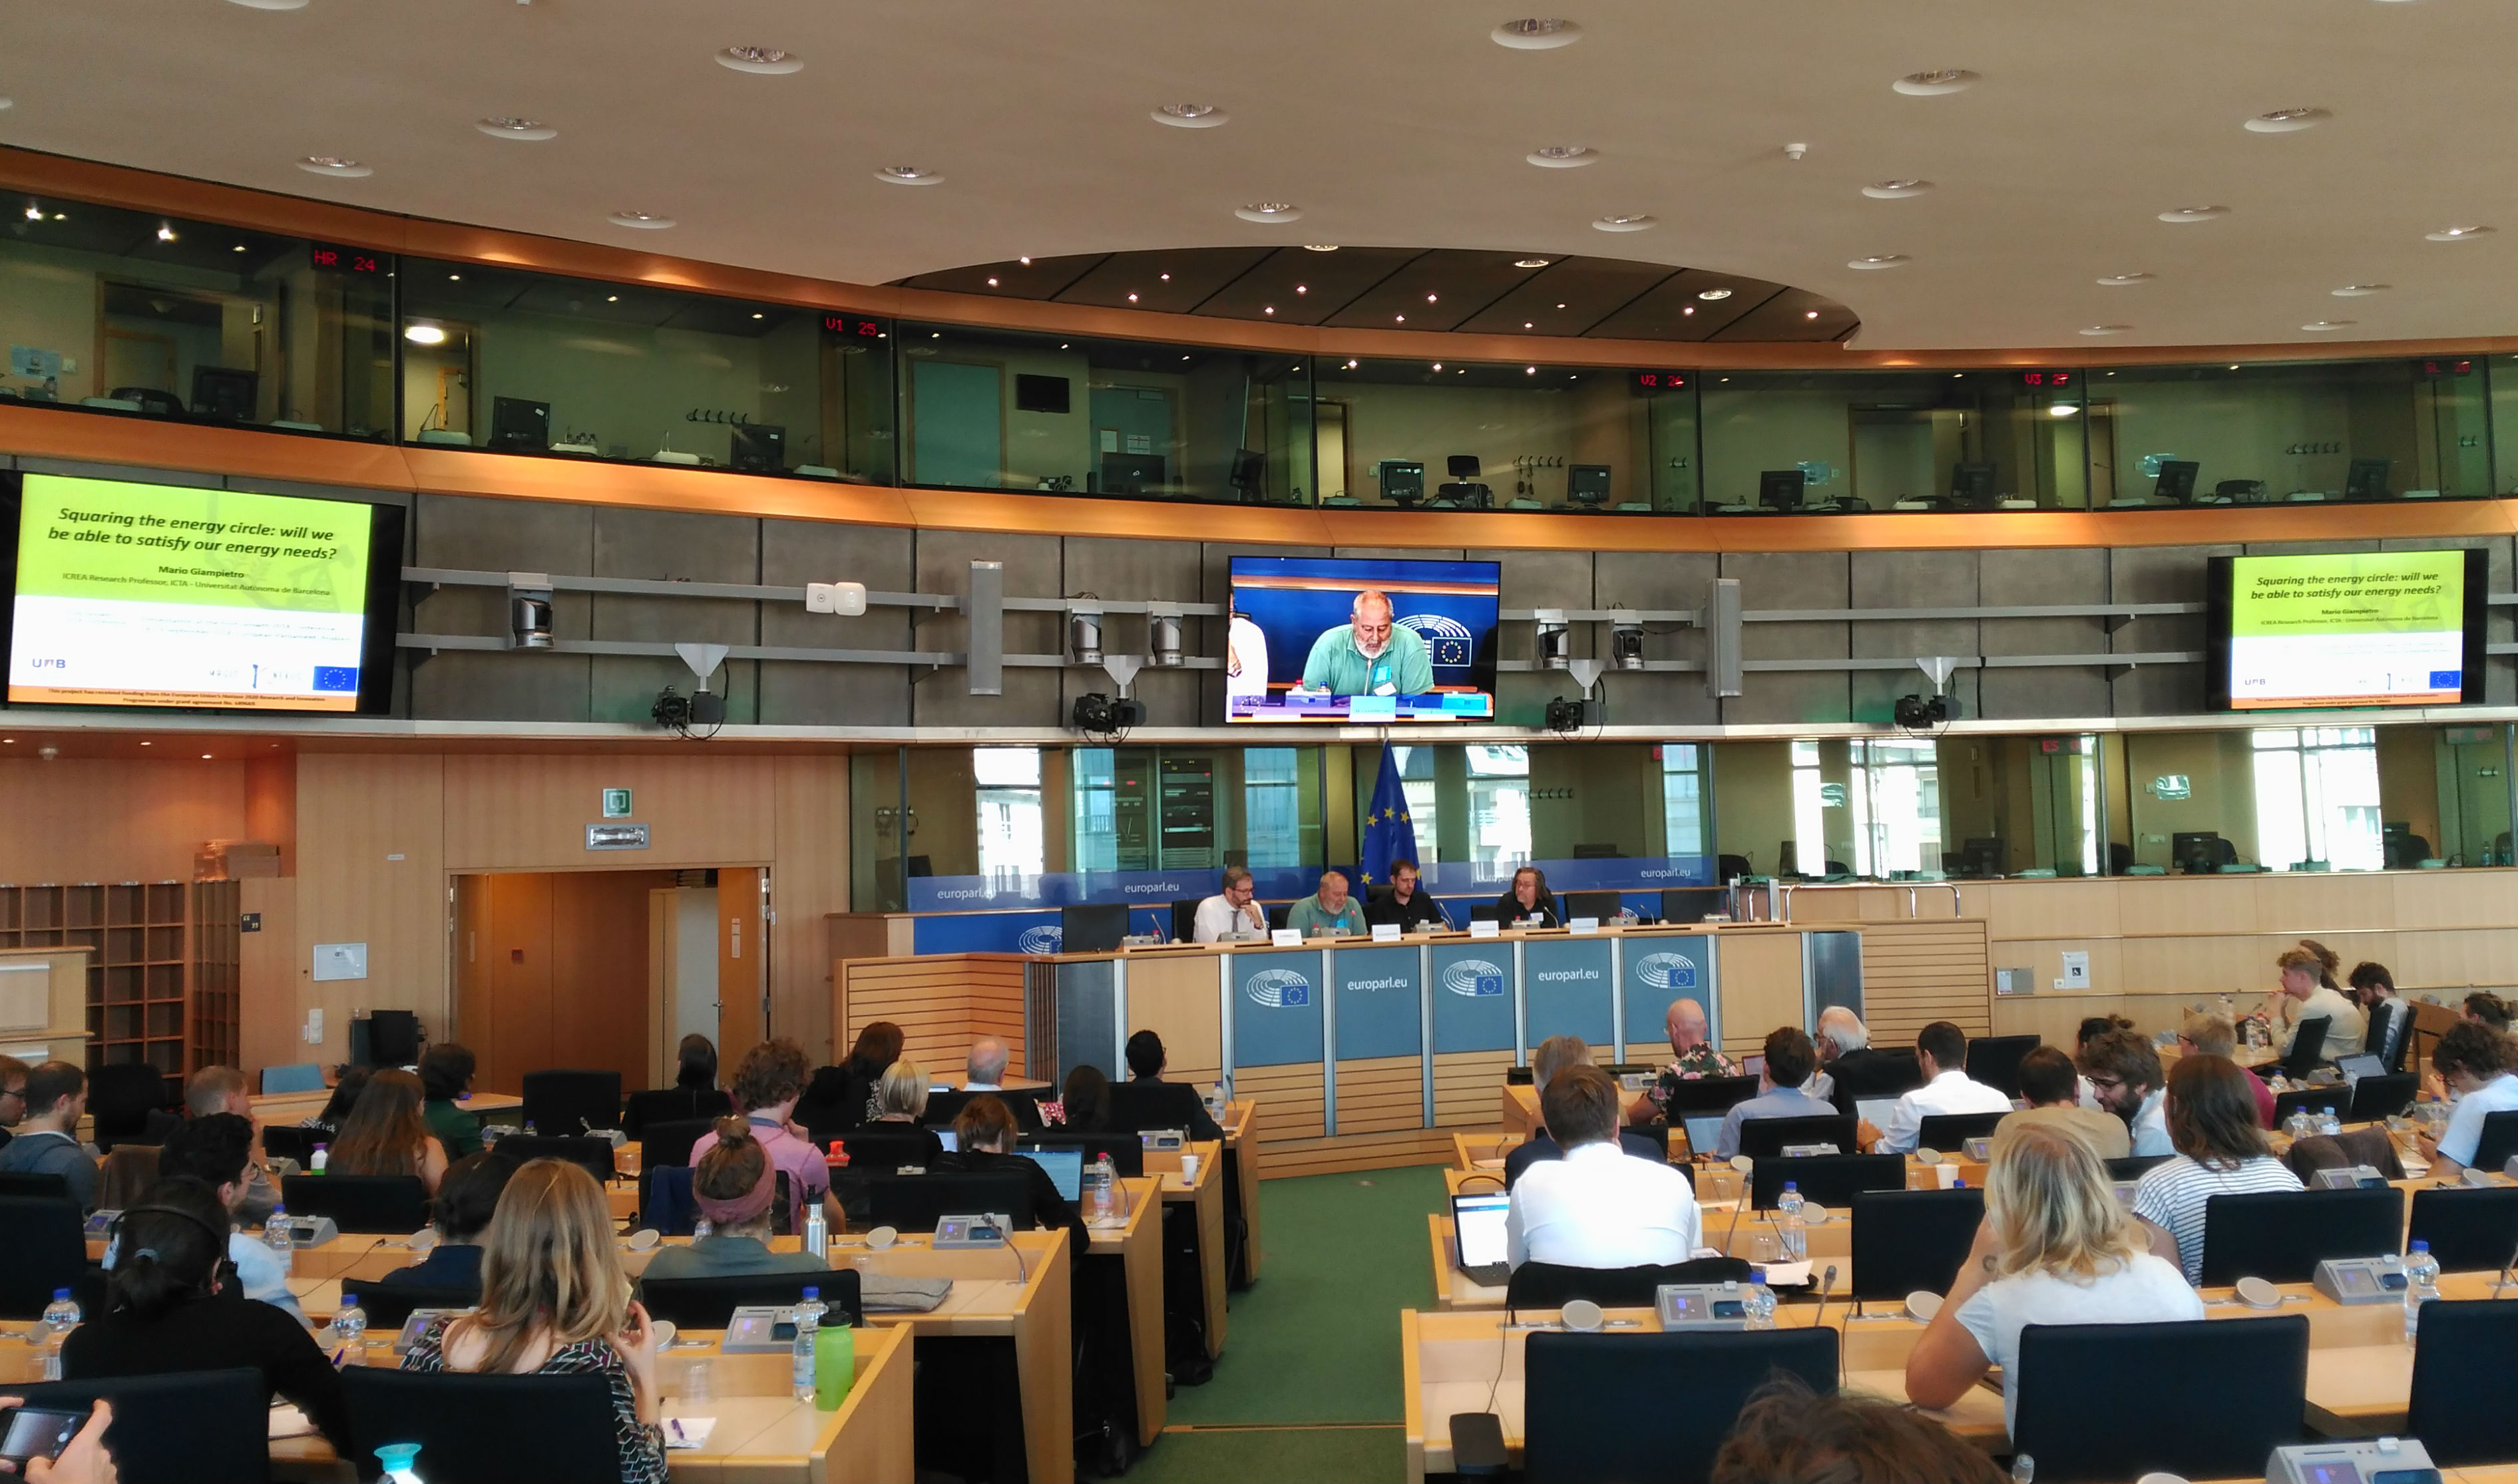 Post-growth2018 Workshop at European Parliament